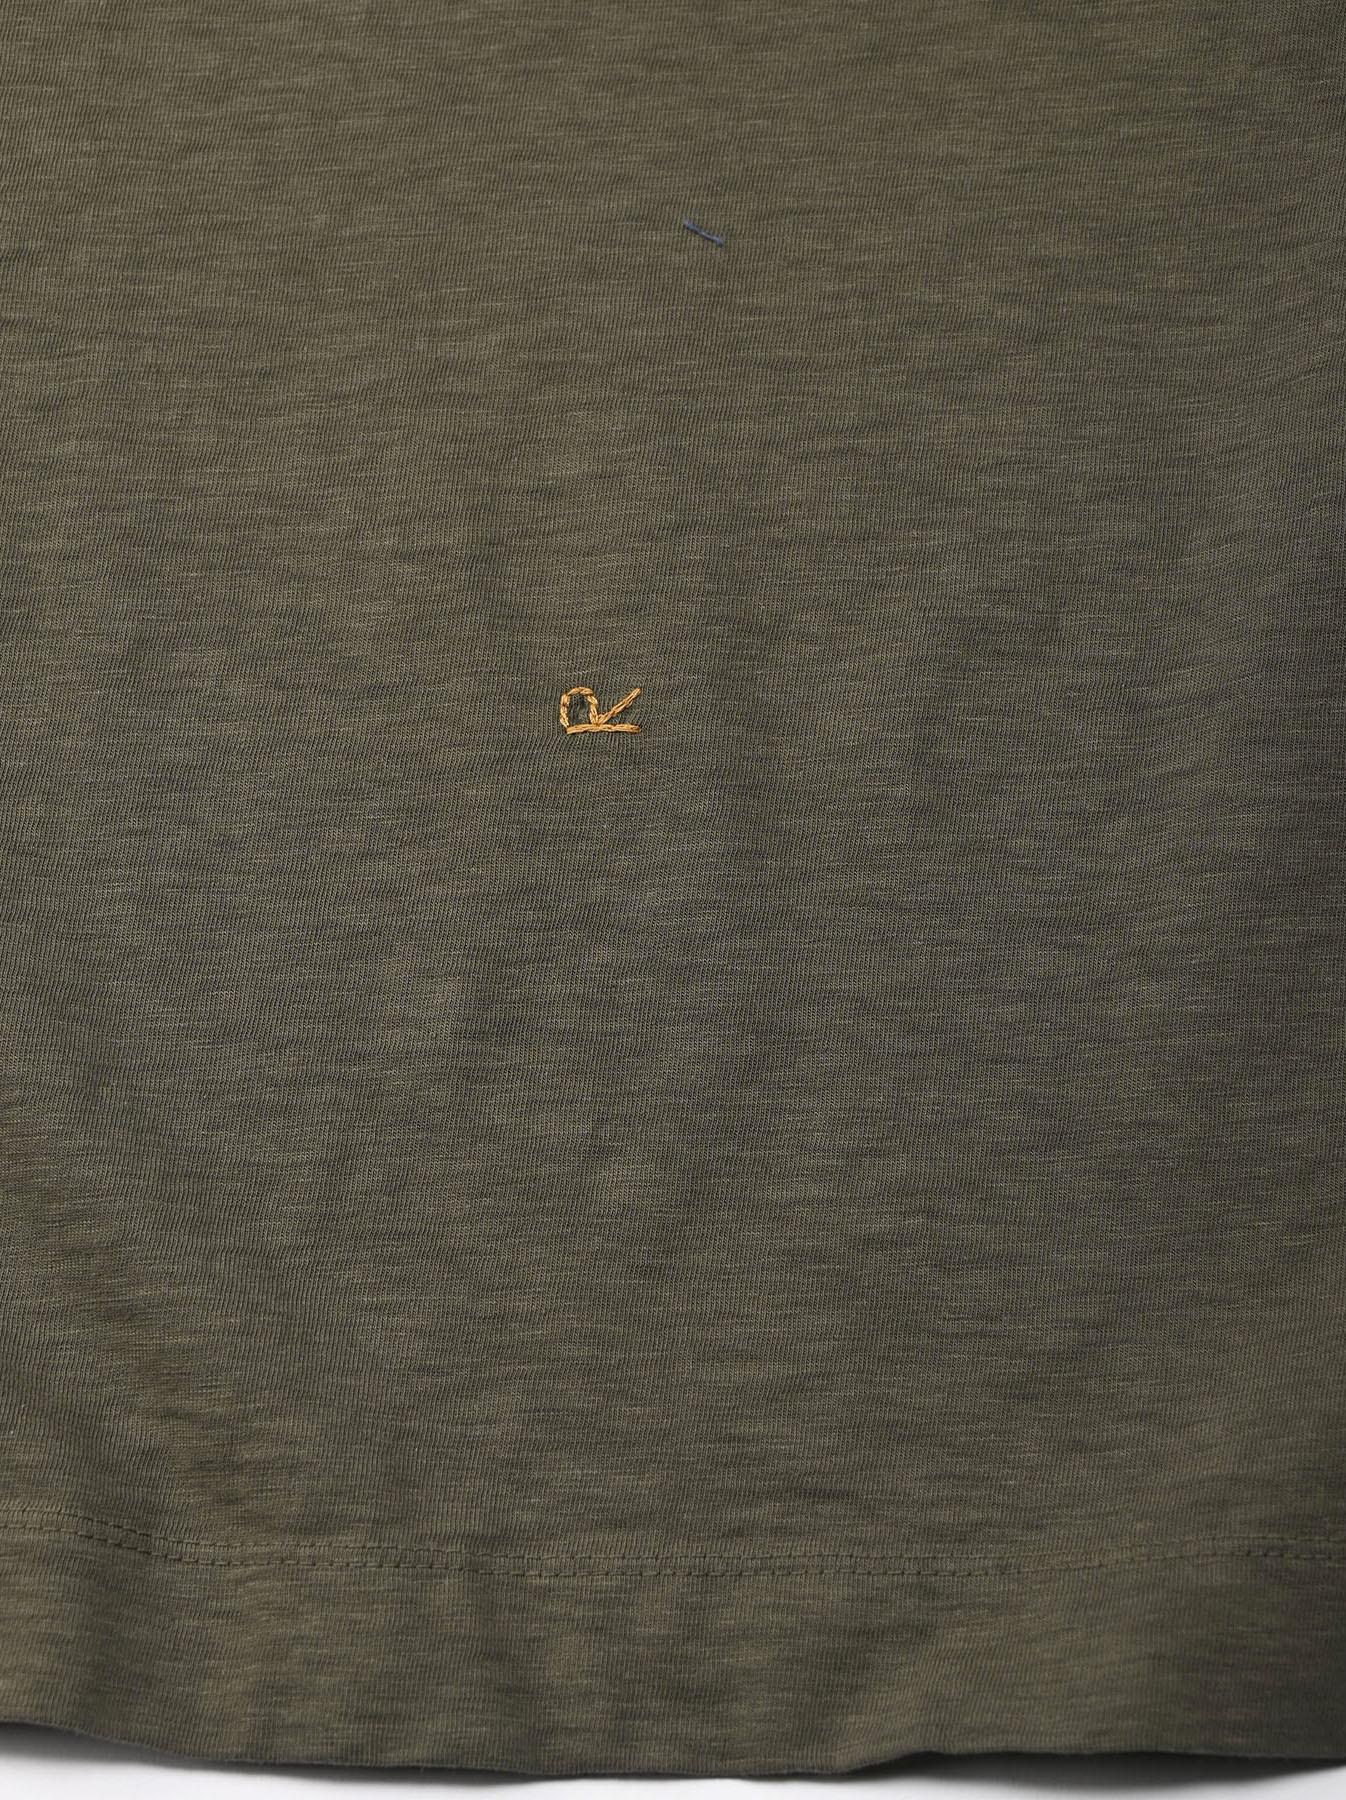 Zimbabwe Cotton Big Slit T-shirt (0721)-6